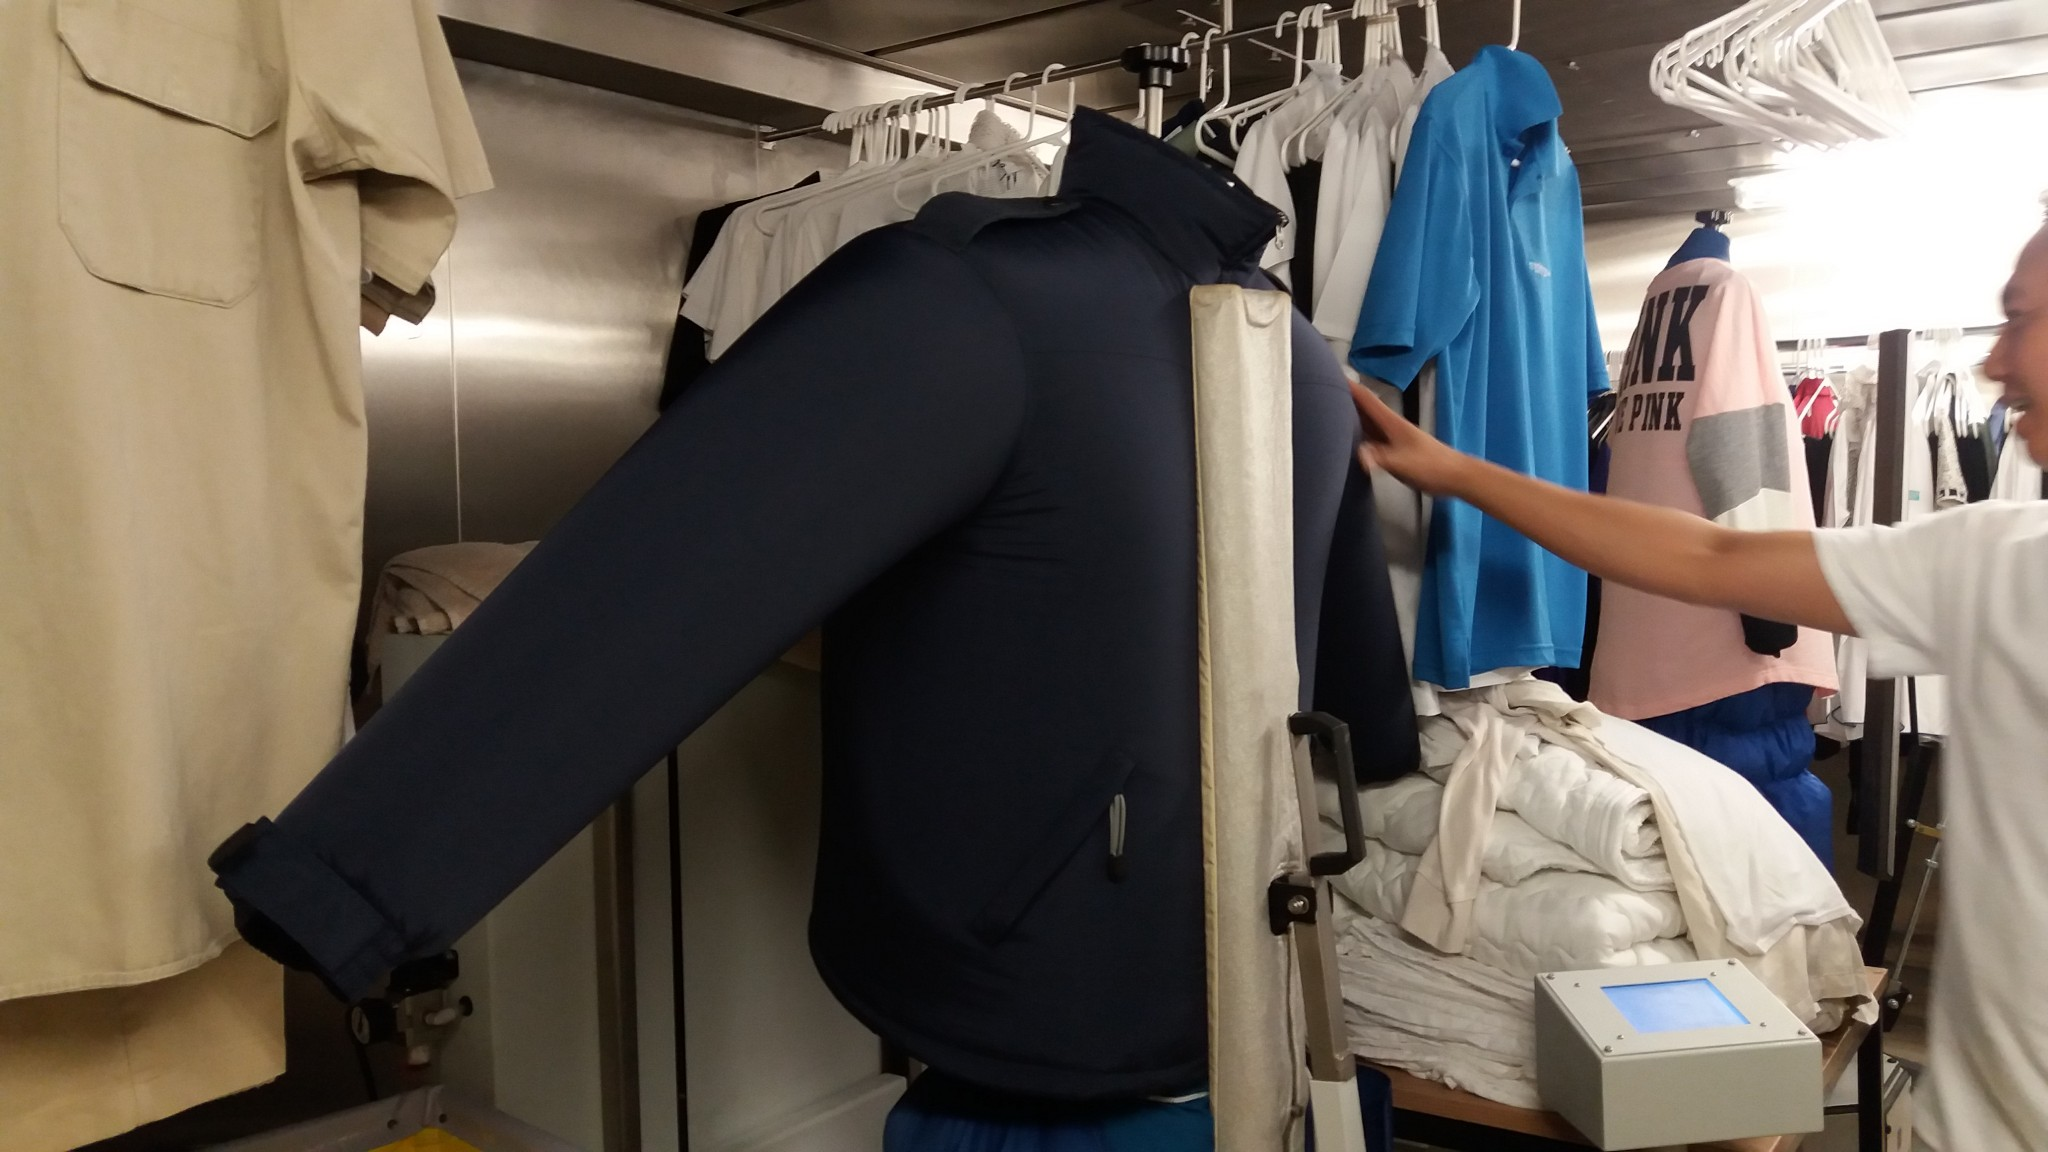 Norwegian Escape Laundry 9